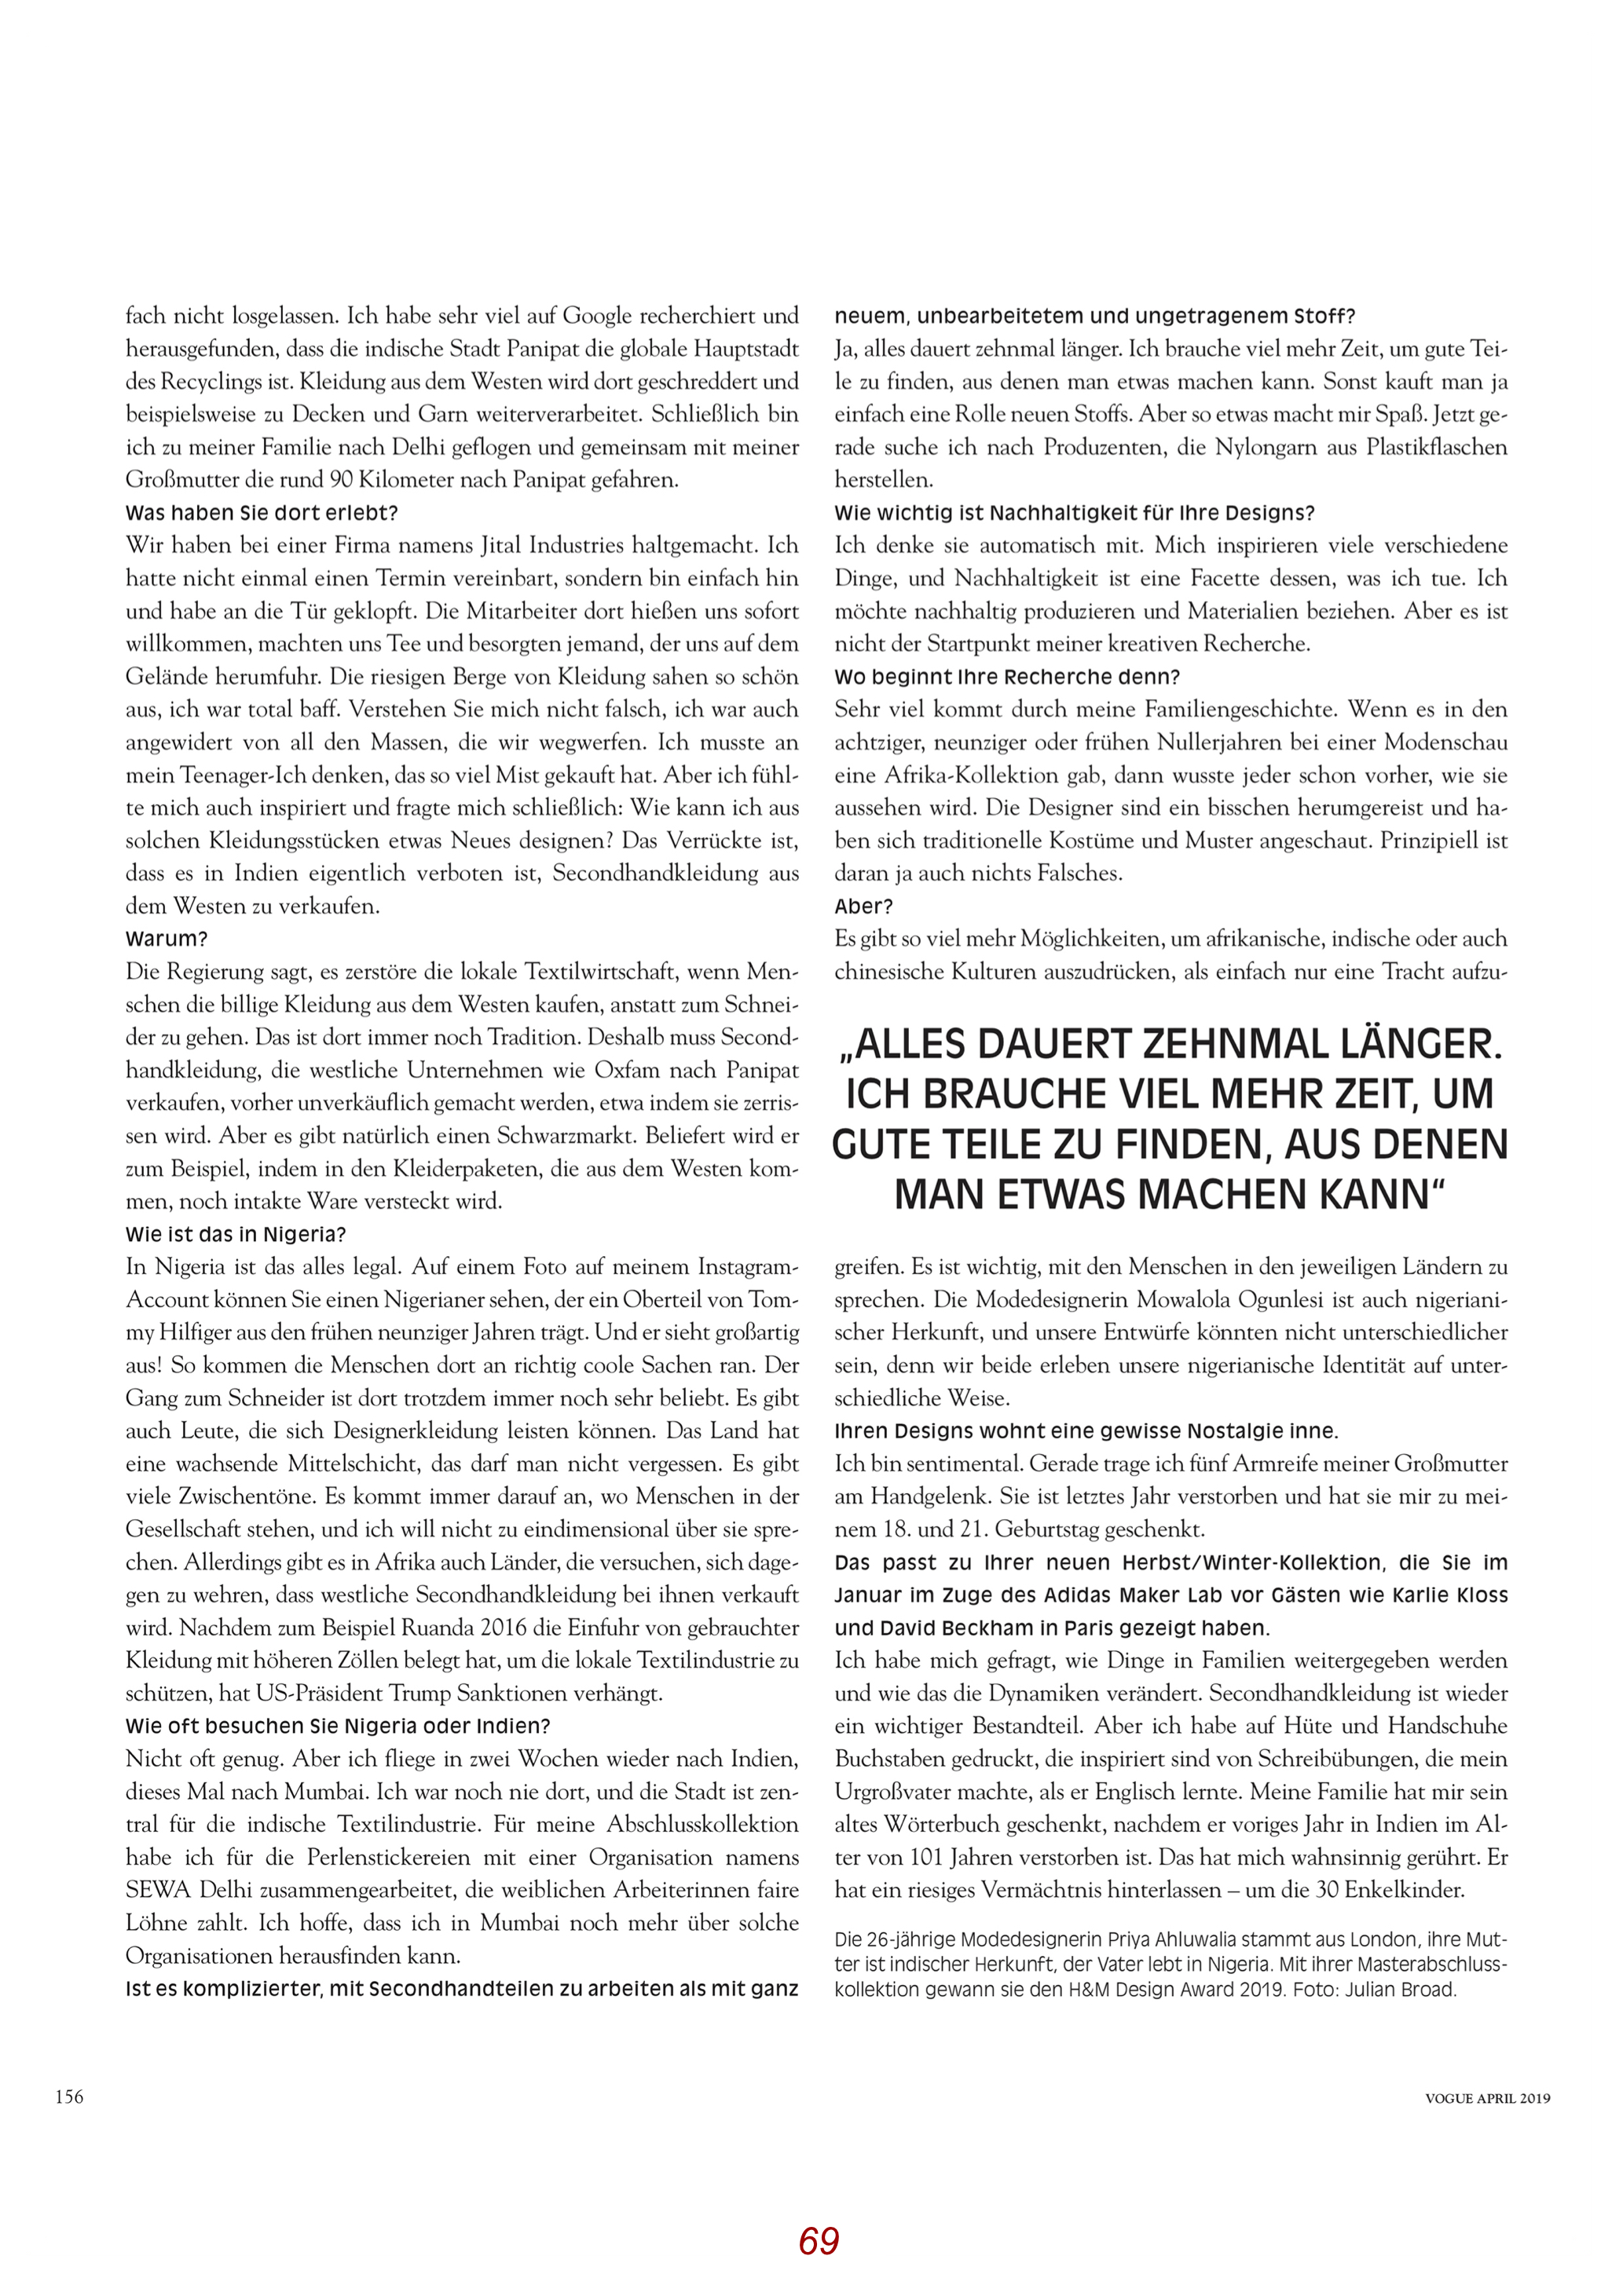 page 69 photo.jpg